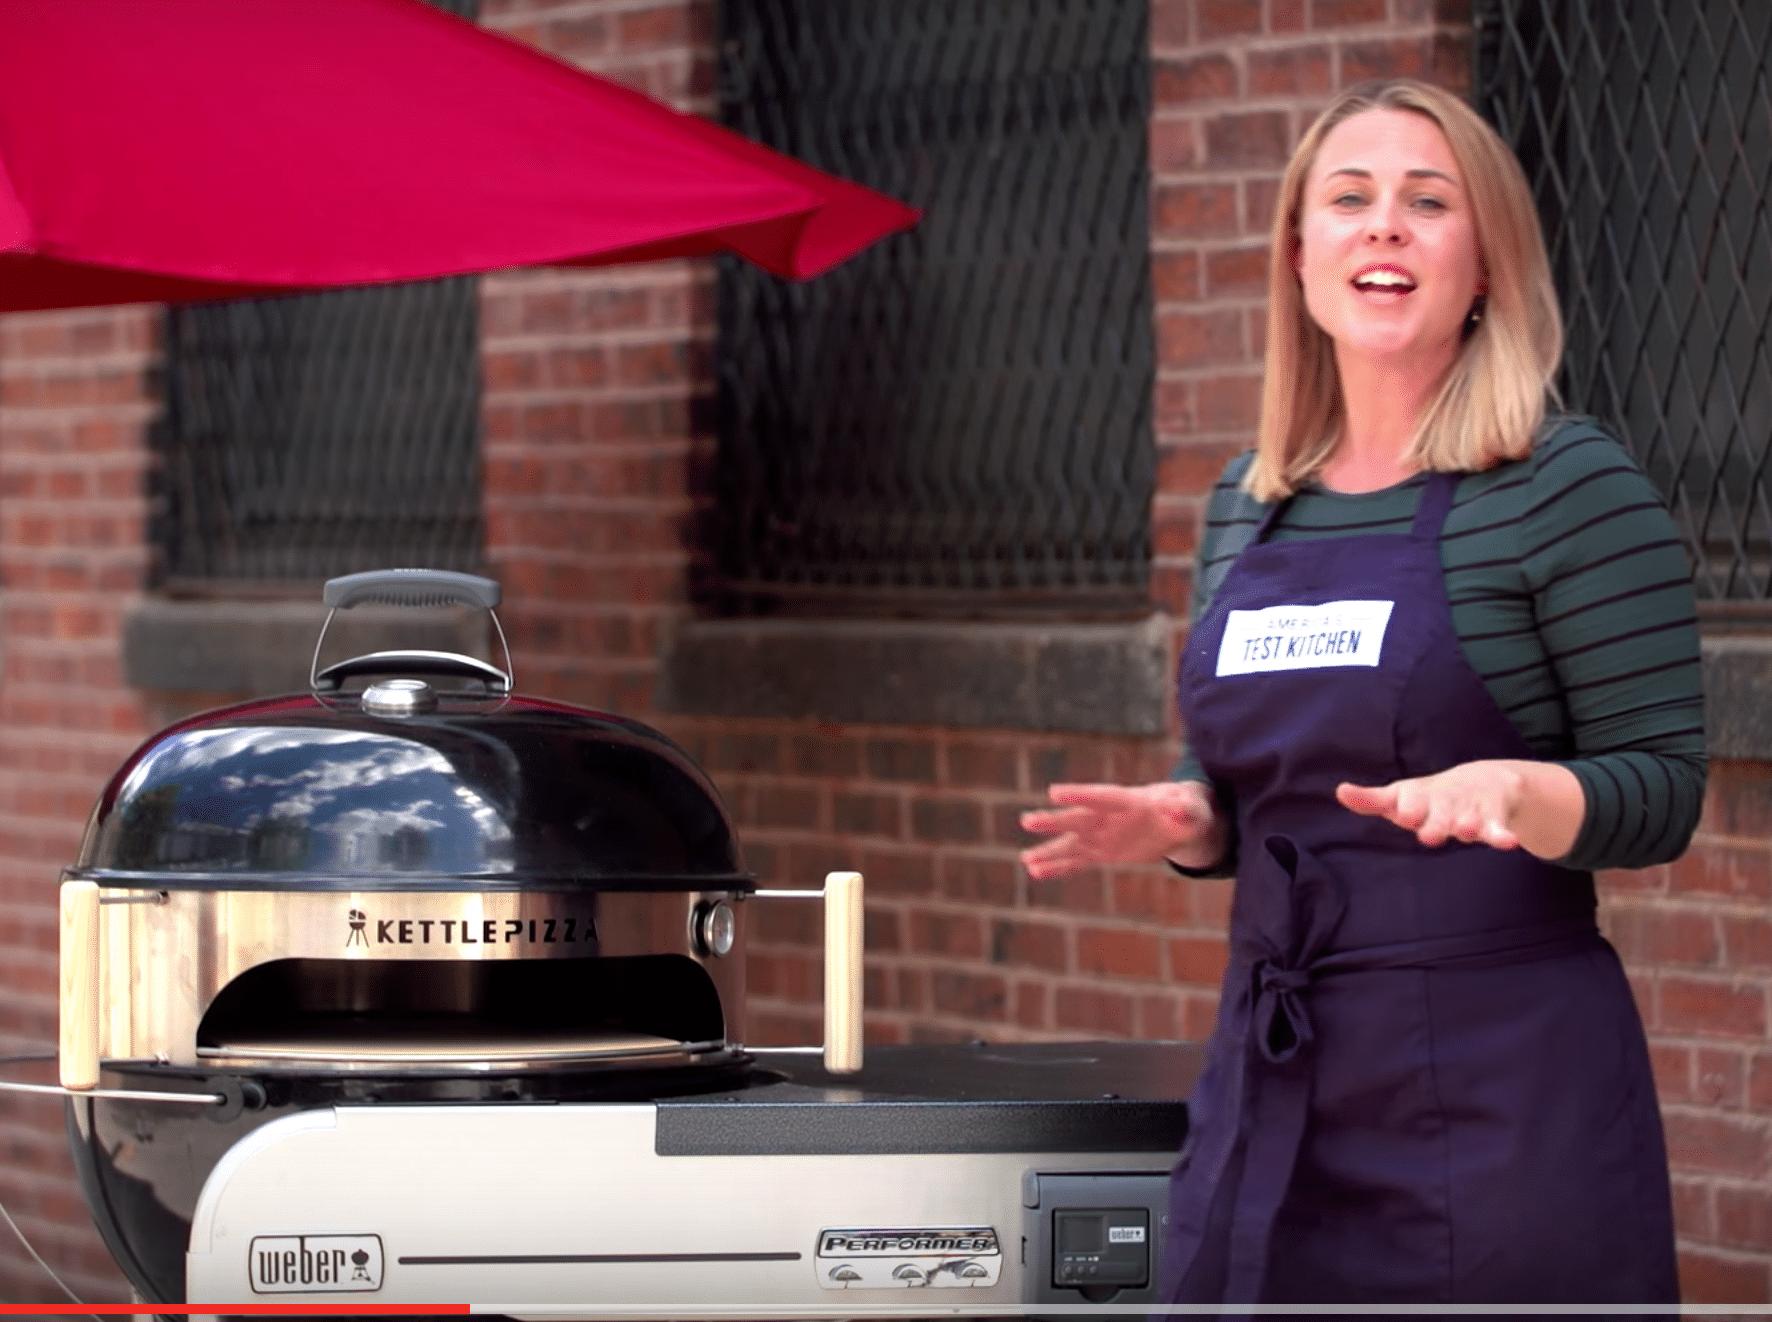 KettlePizza On America's Test Kitchen